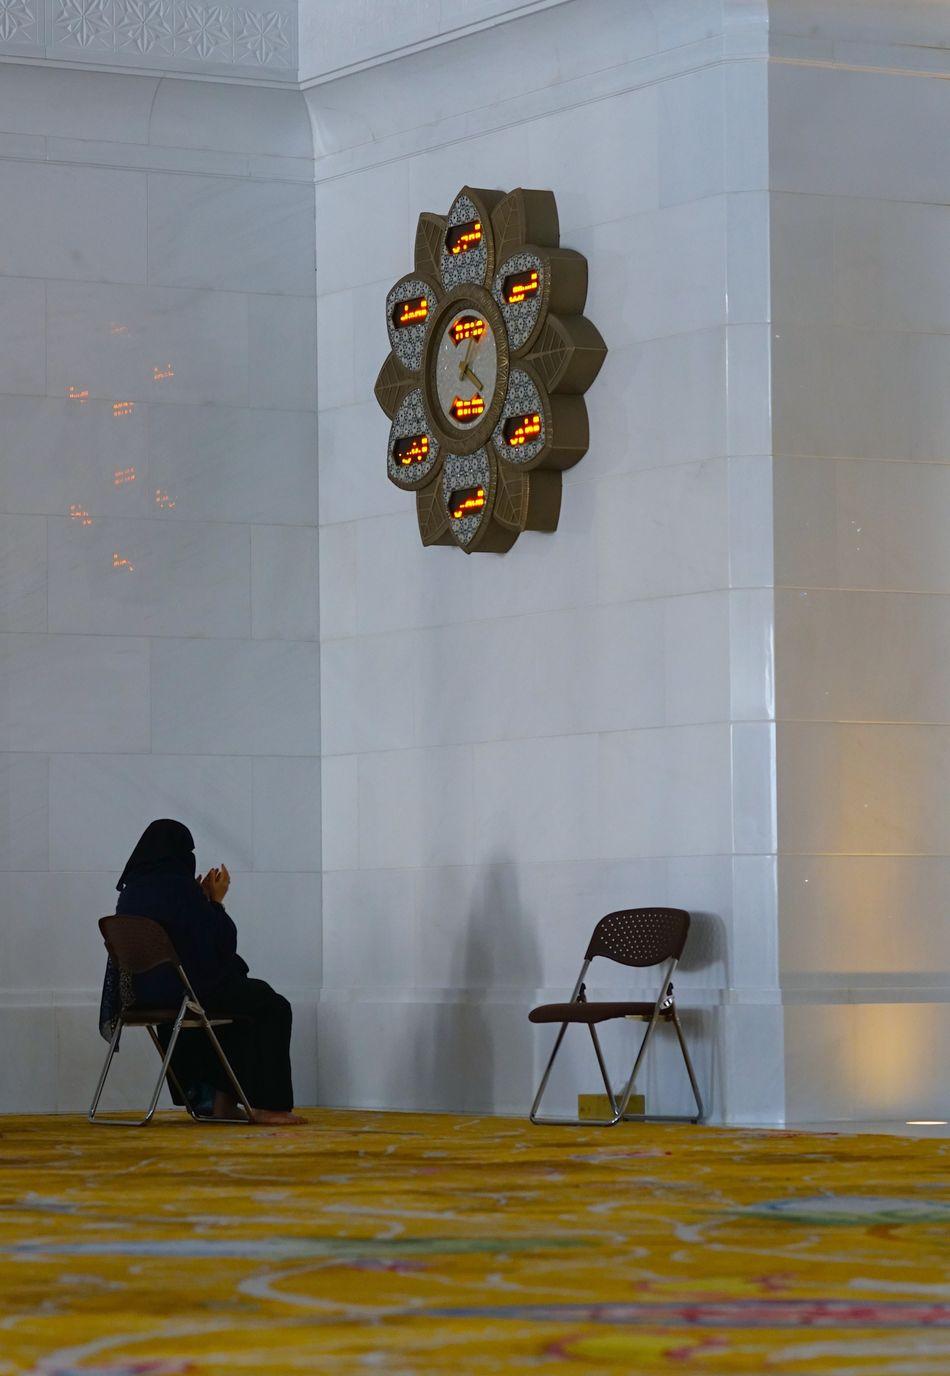 Abu Dhabi Abu Dhabi Grand Mosque Adults Only Chair Clock Indoors  Islam Mosque Munajat Muslim Culture Muslim Woman Muslim Woman Praying Non Recognizable Female One Person Prayer Prayer Time Praying Sheikh Zayed Grand Mosque Women Around The World Women Around The World Women Around The World